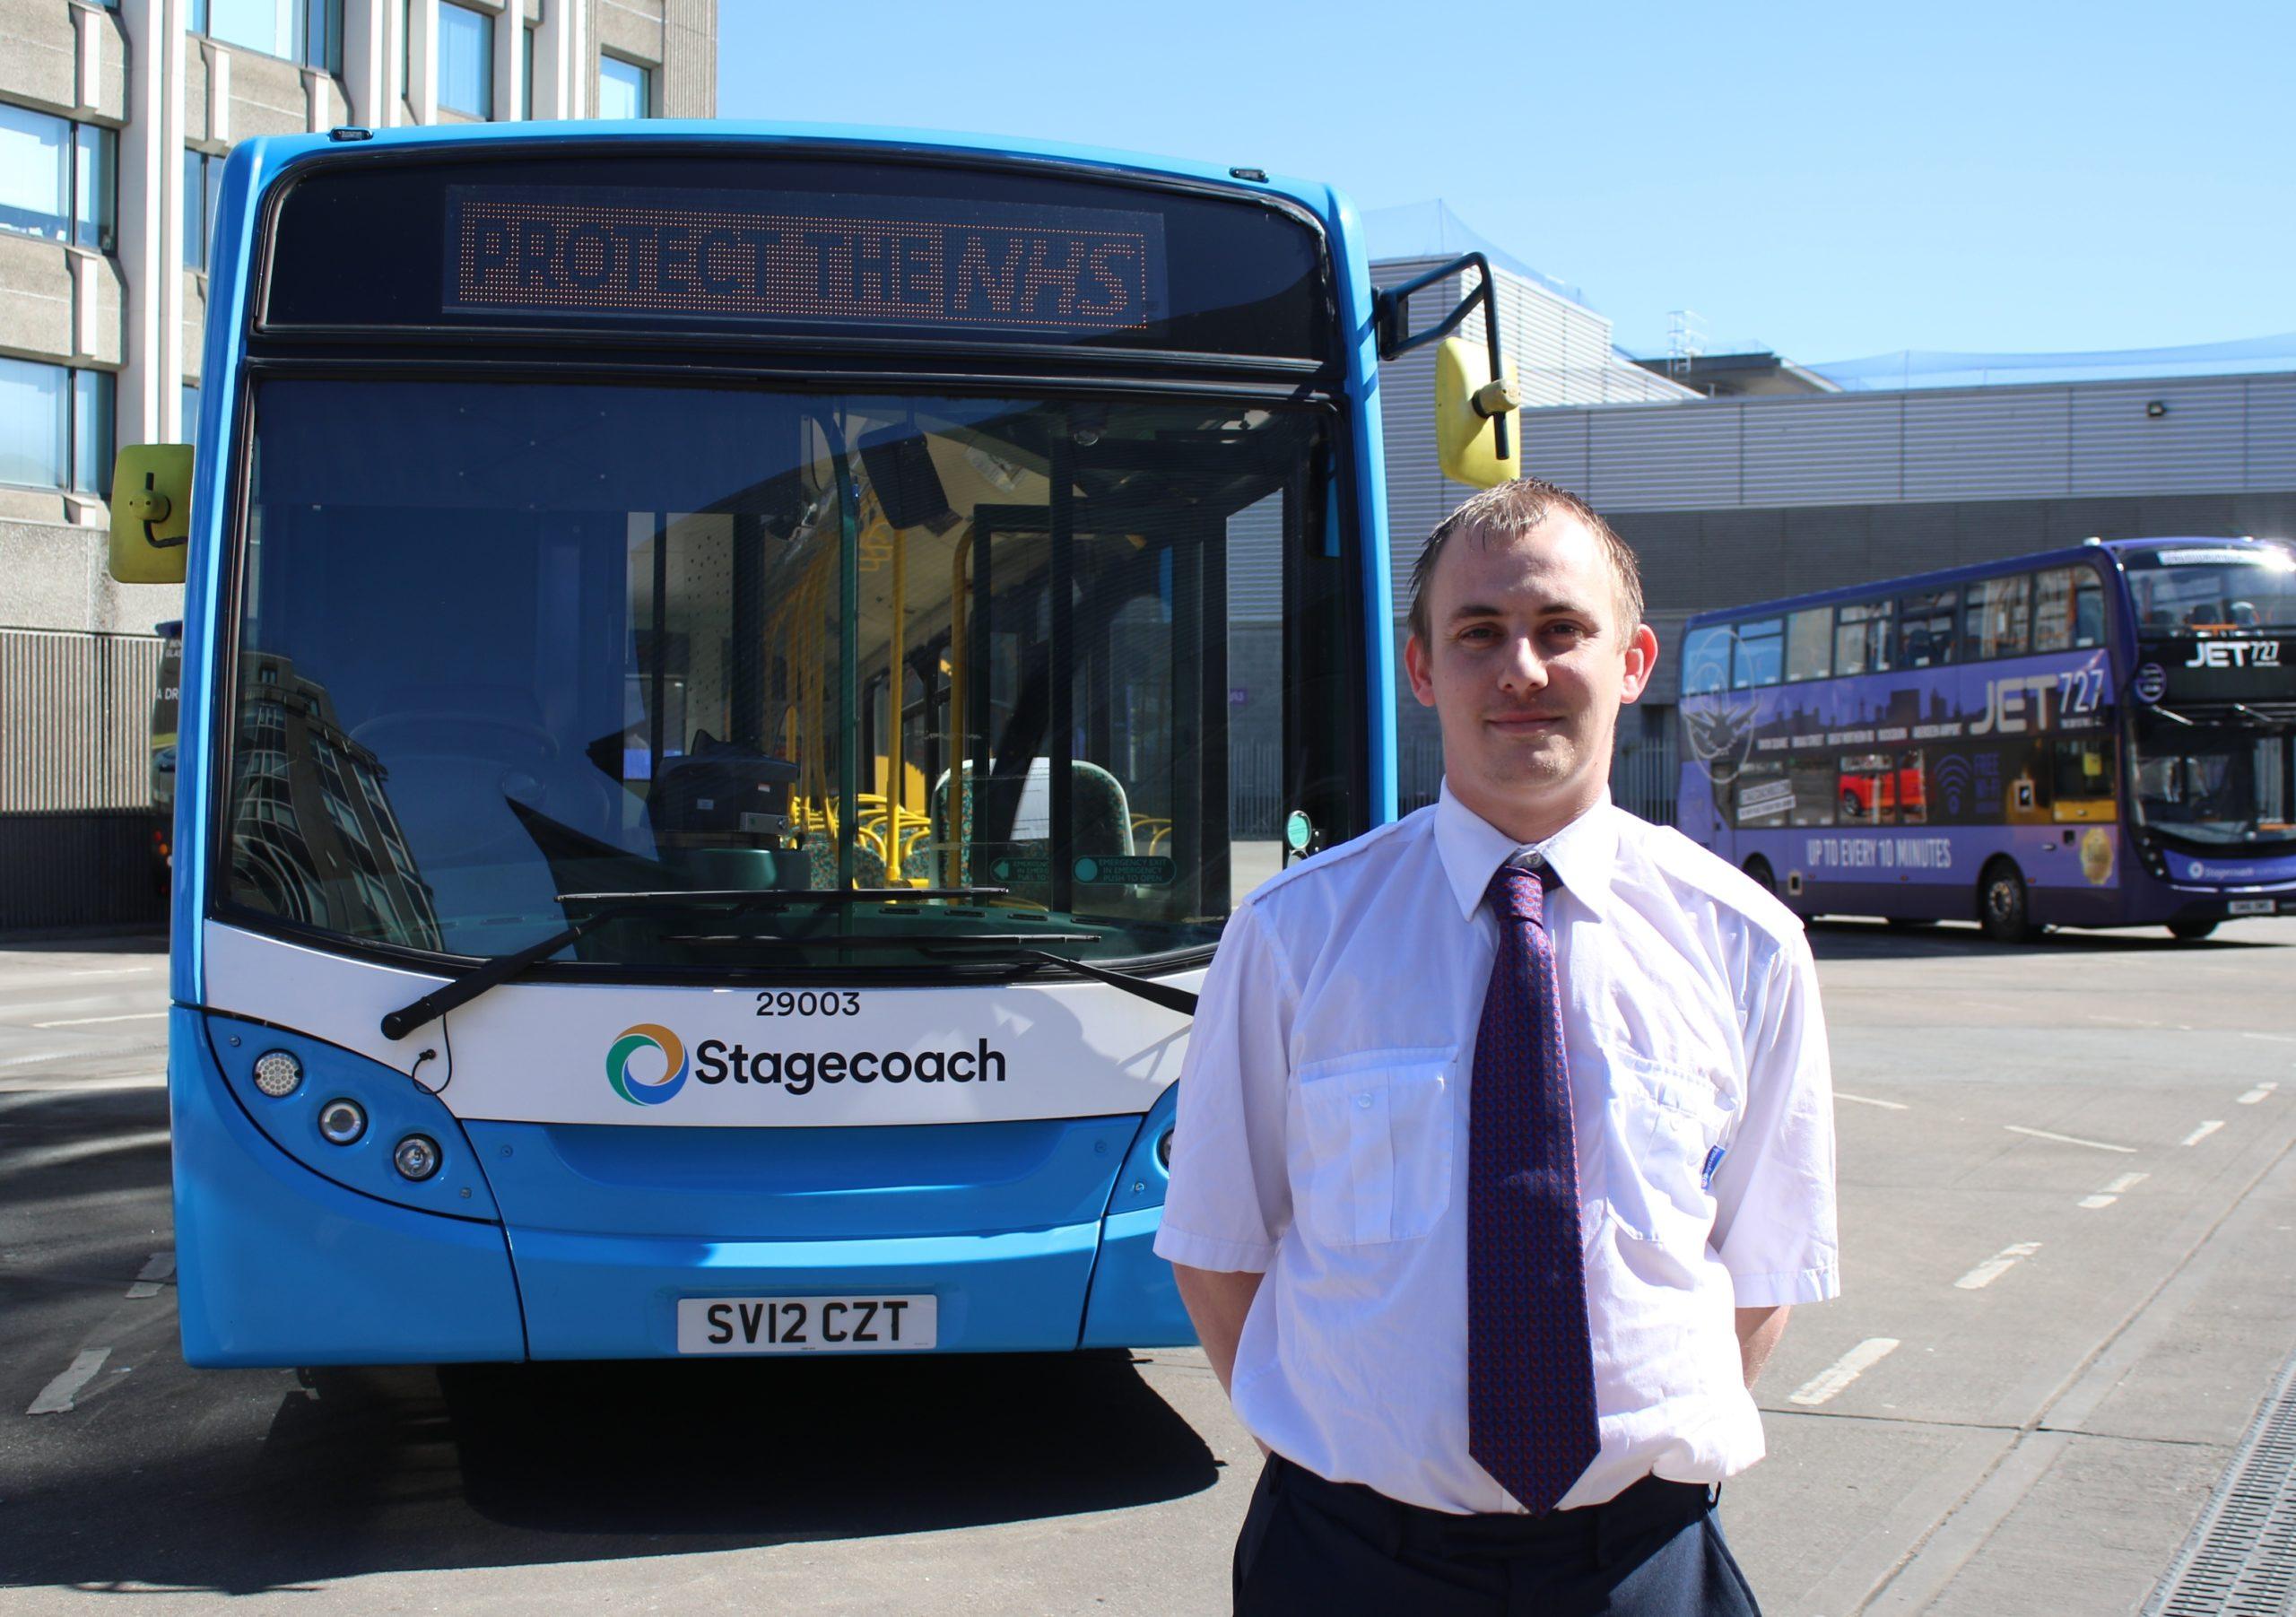 Stagecoach employee Daryl Mitchell